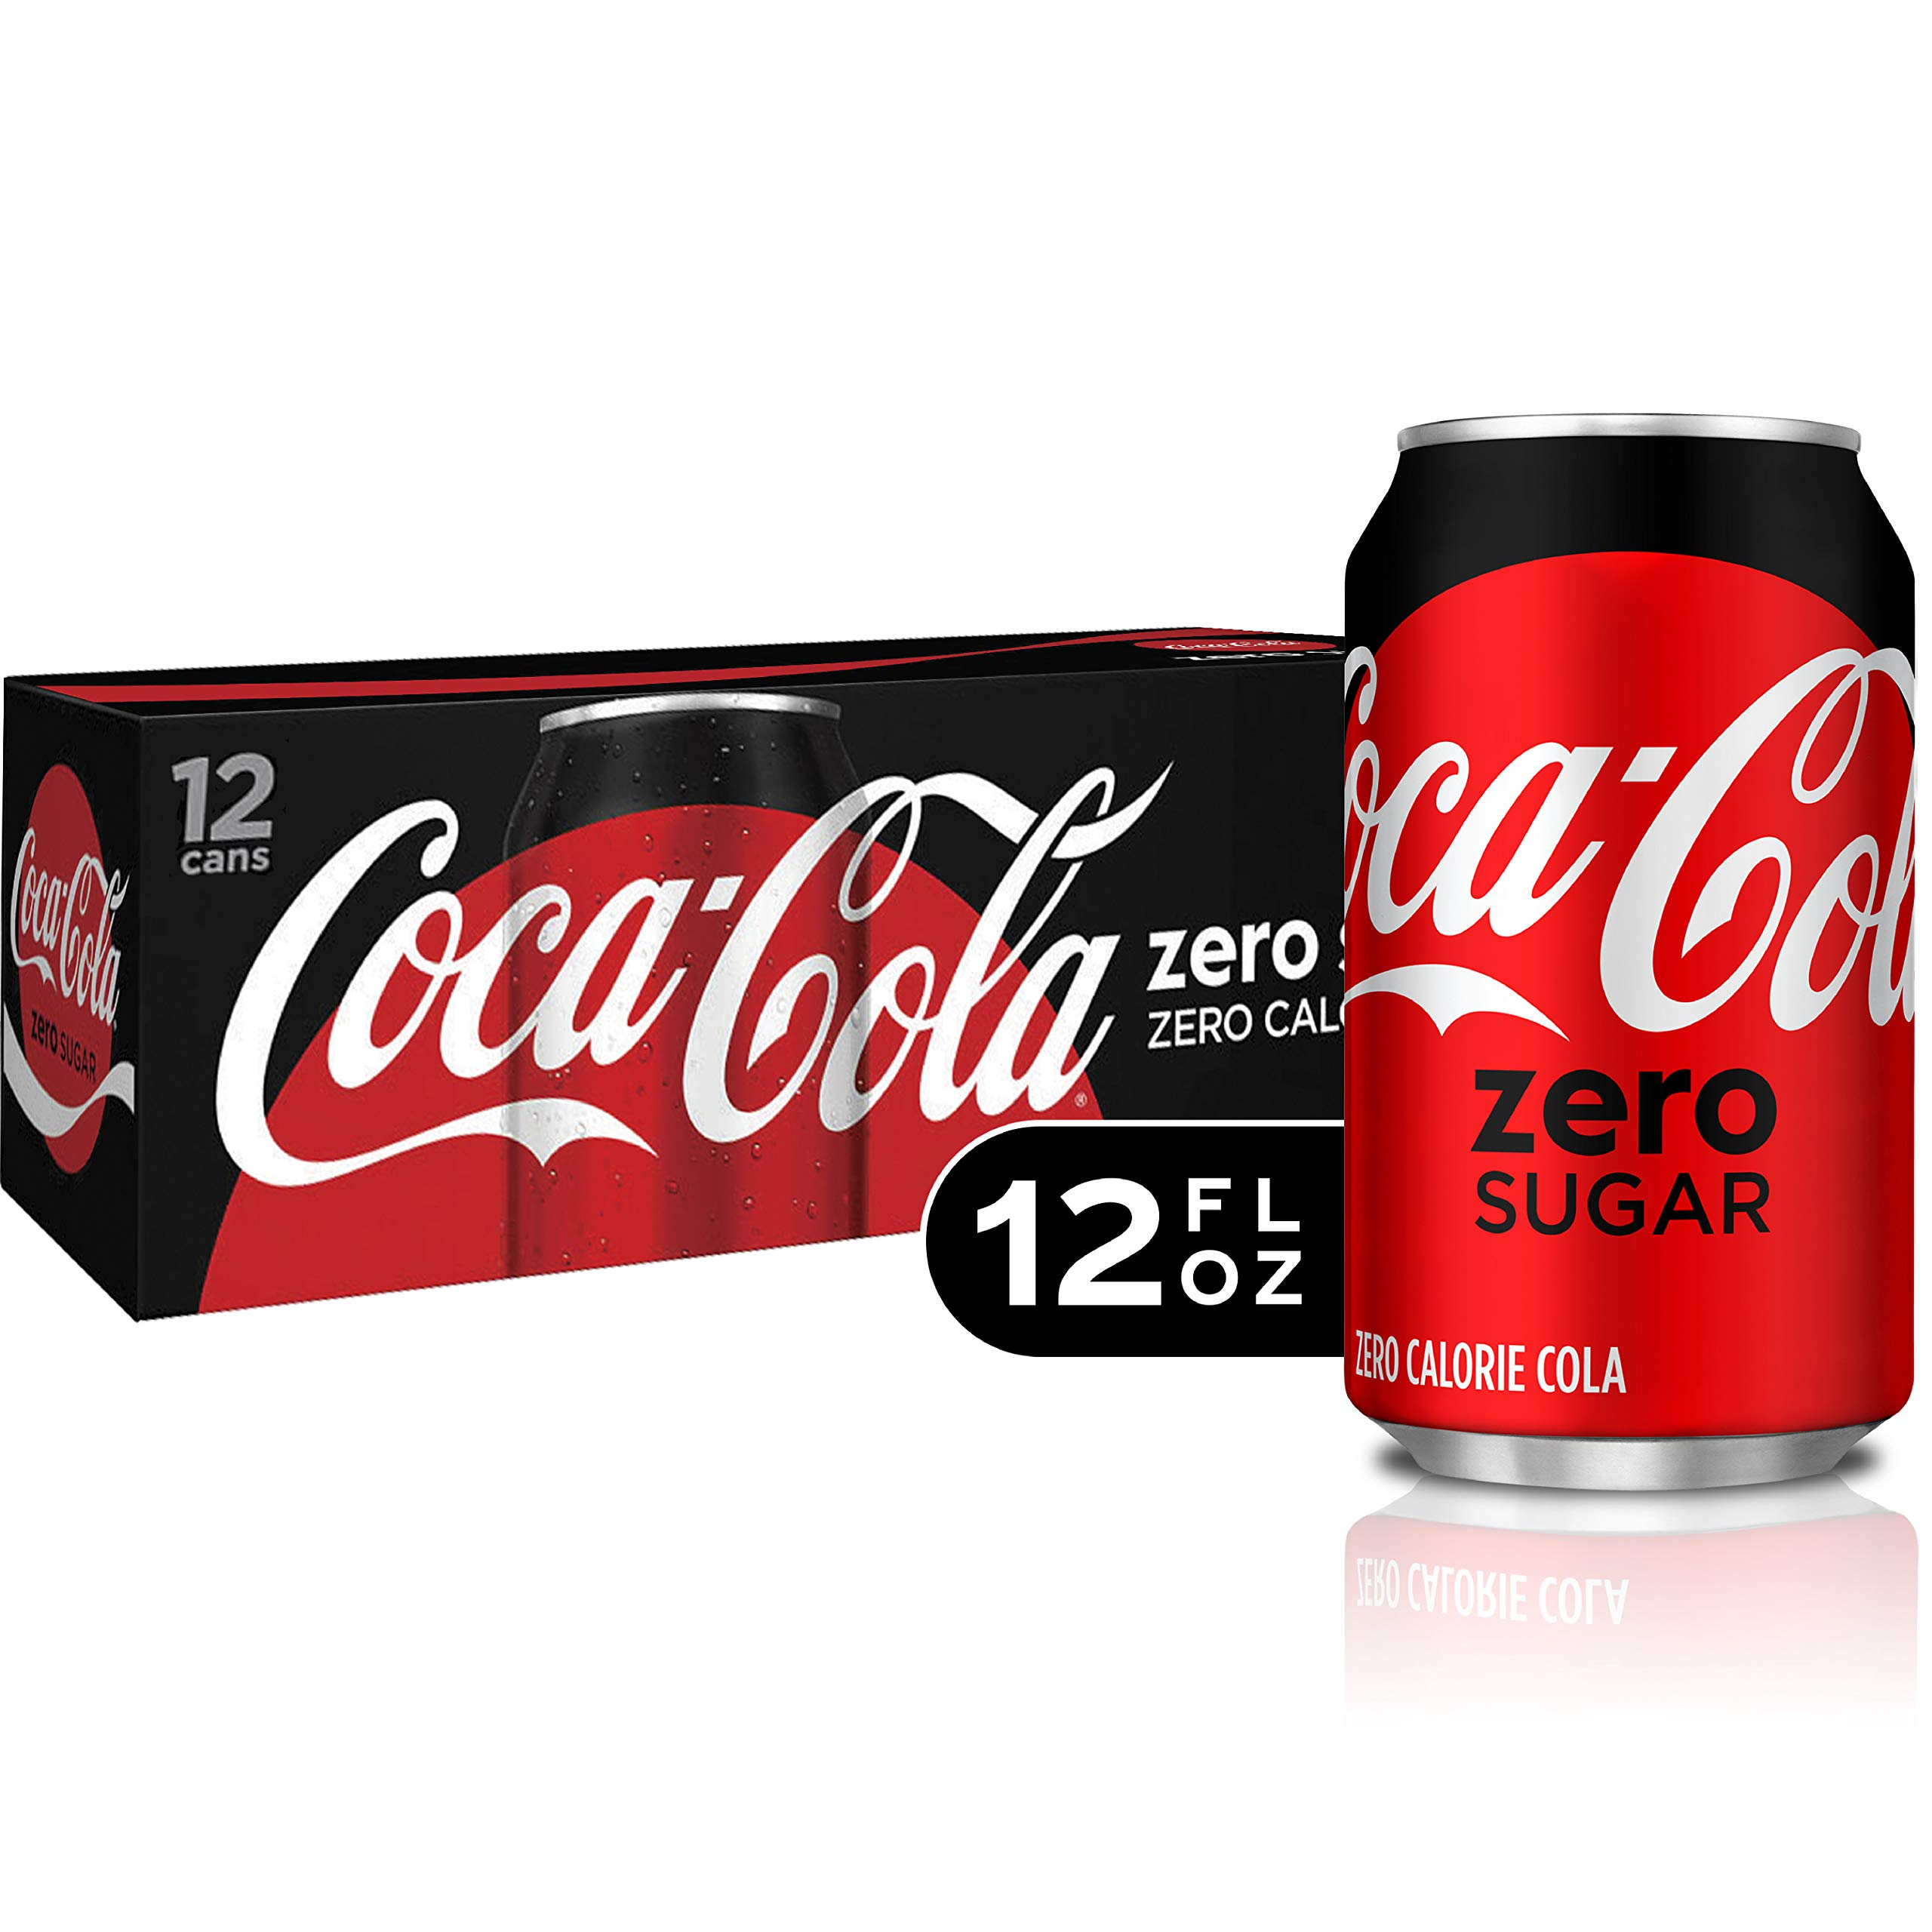 Coke Zero Sugar Diet Soda Soft Drink, 12 fl oz, 12 Pack